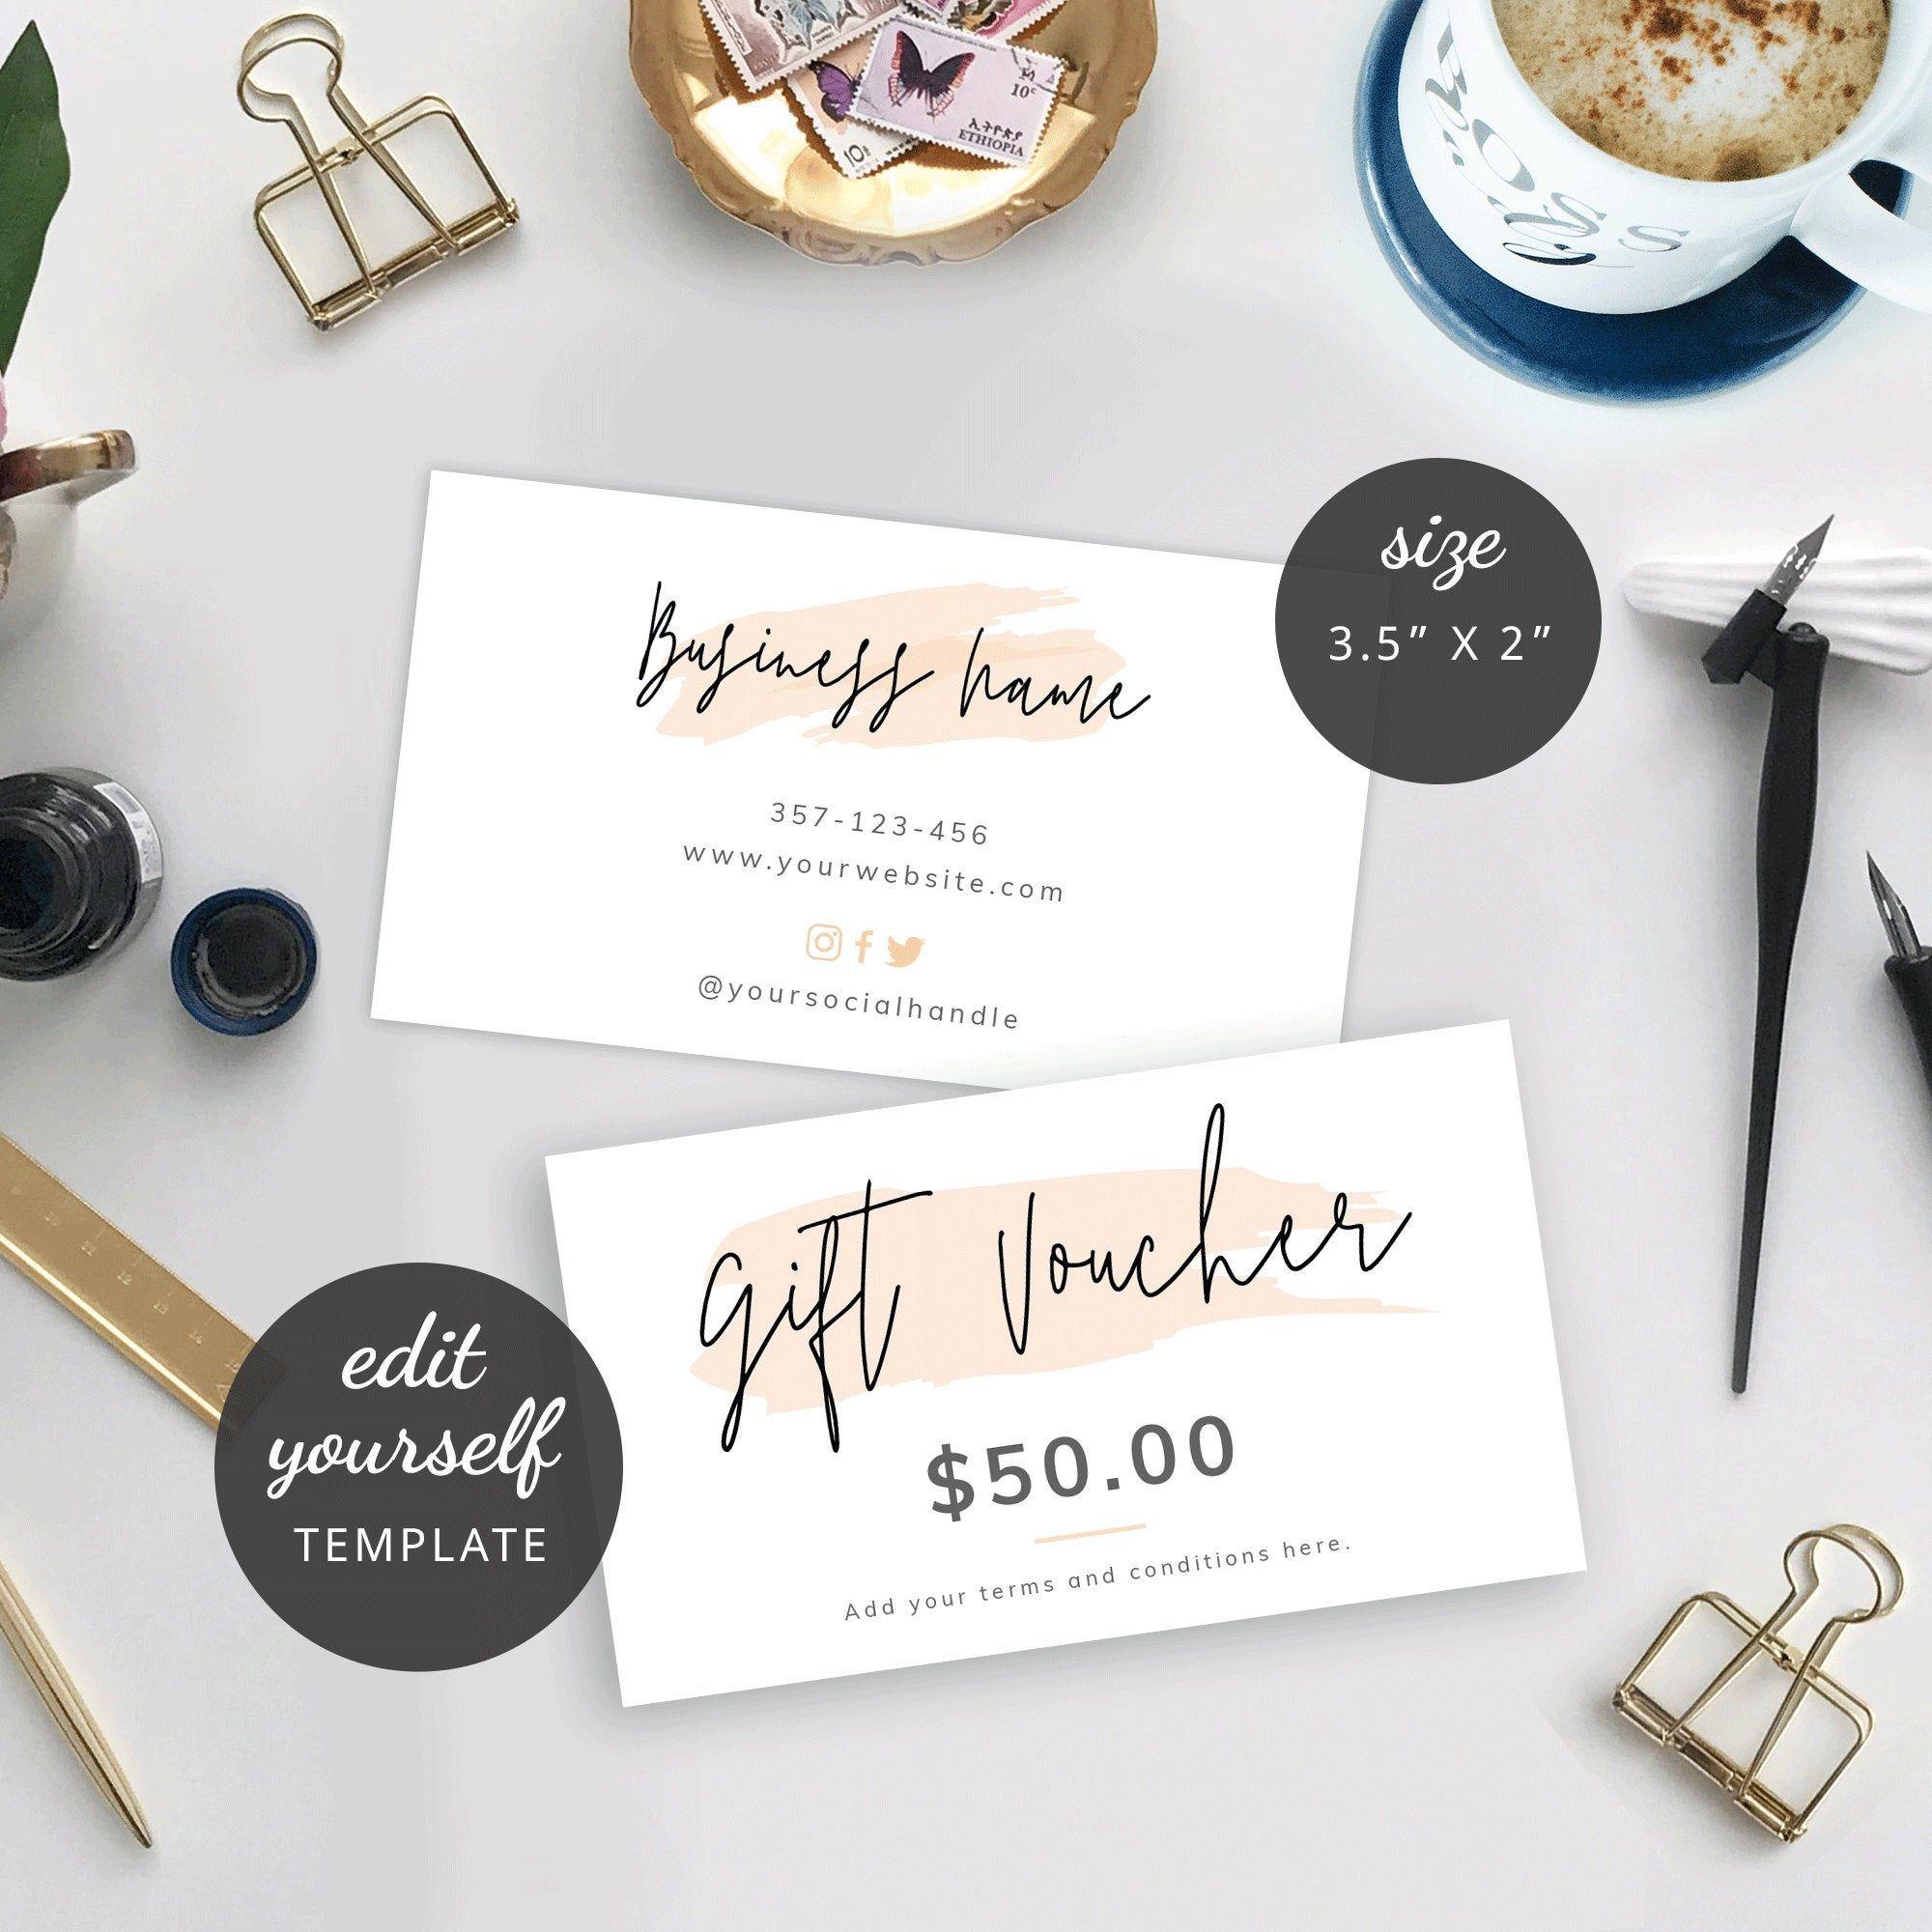 Mini Gift Voucher Template Editable Gift Card Design Small Etsy Gift Voucher Design Gift Card Design Voucher Design